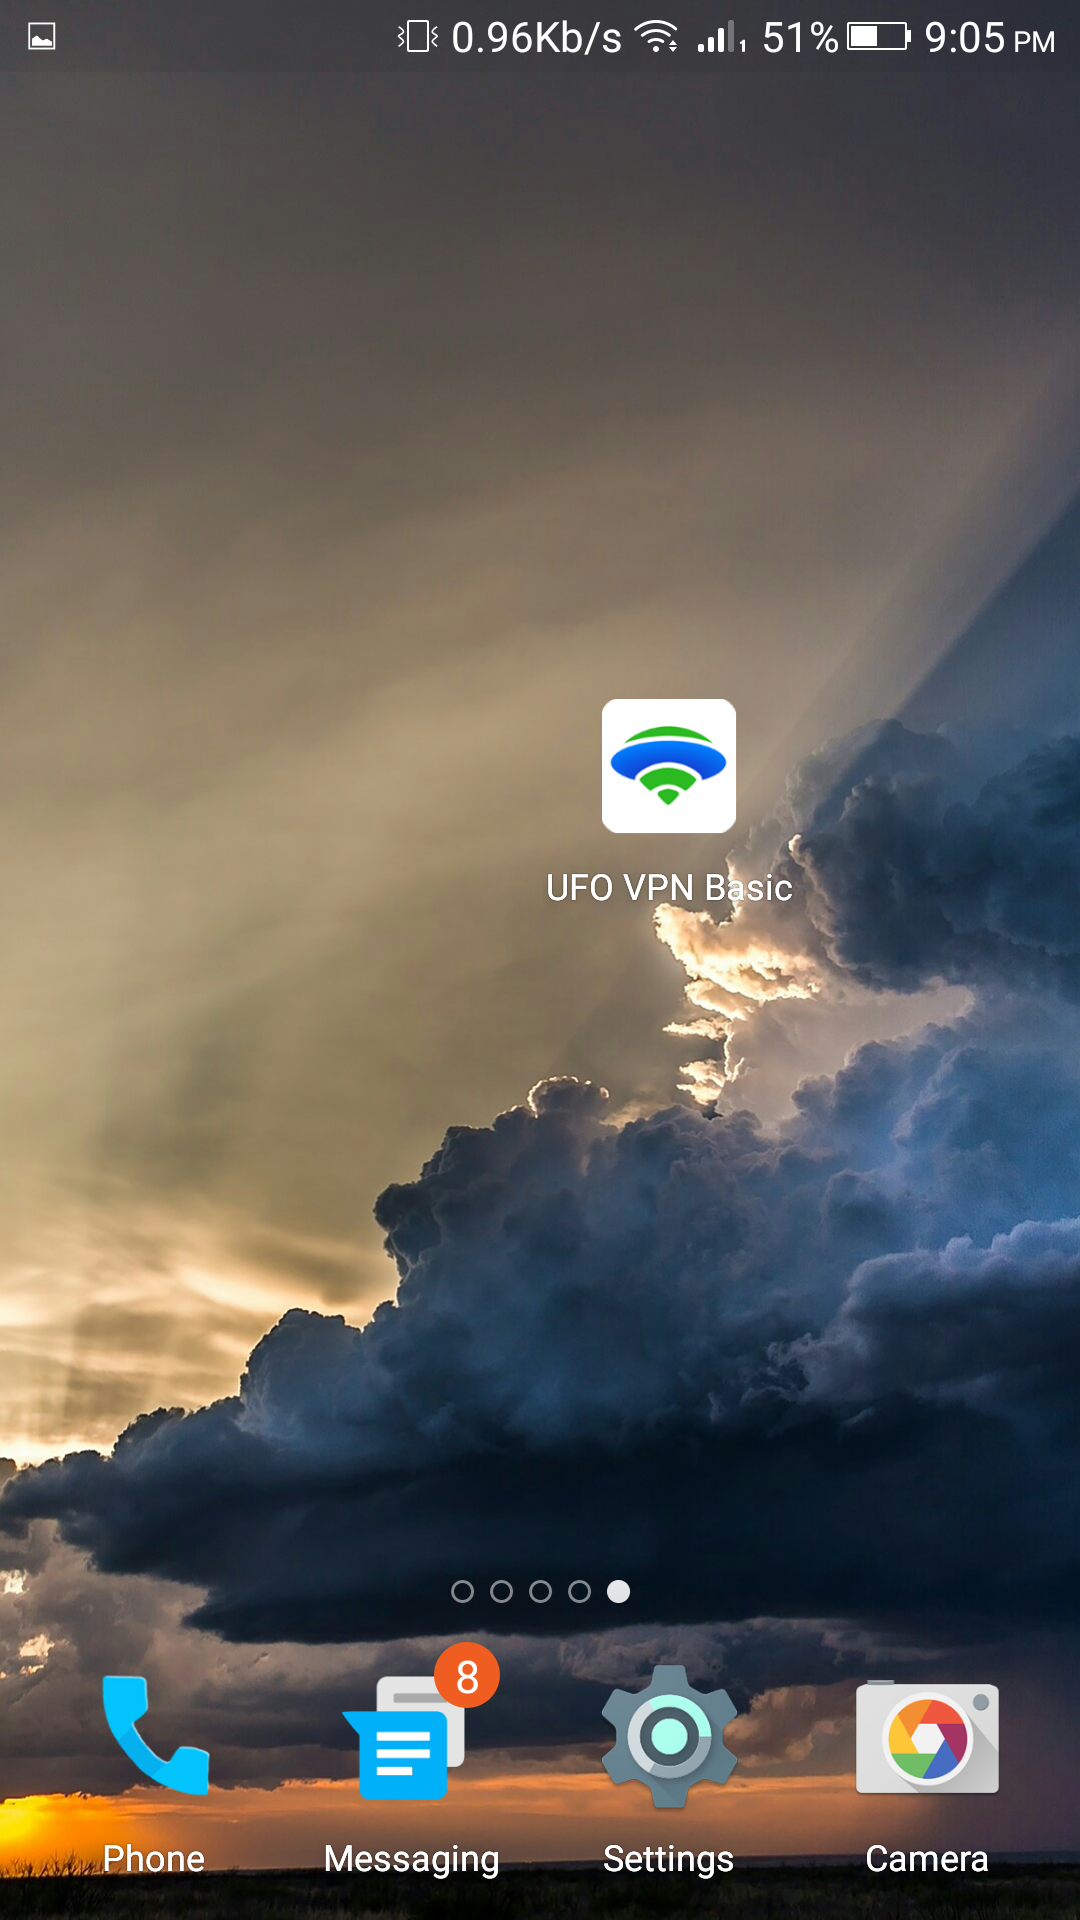 UFO VPN Basic - Proxy VPN Gratis y WiFi Seguro Mod apk